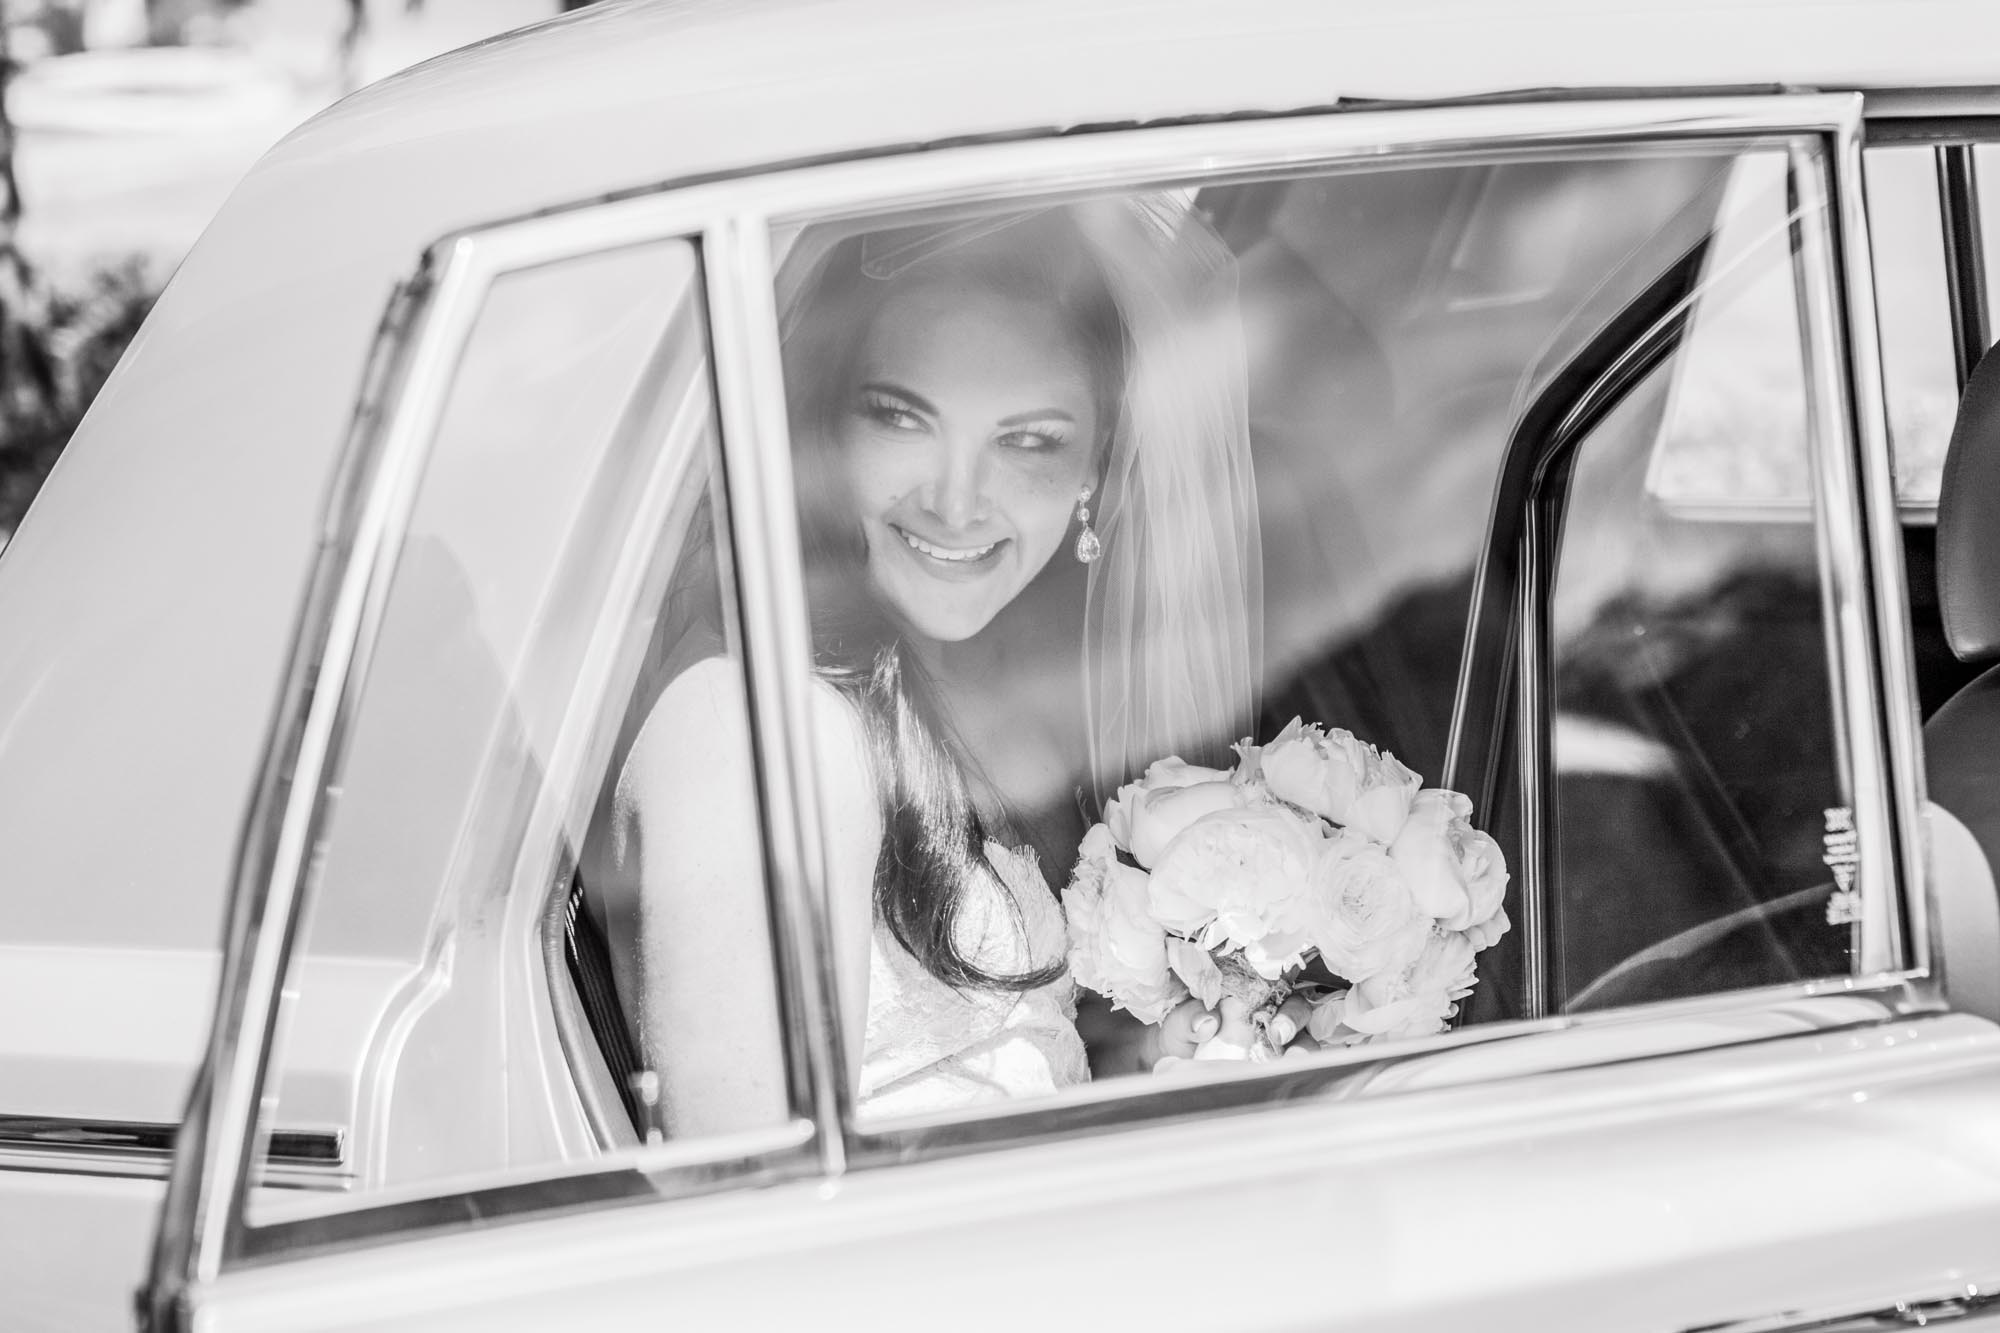 wv-wedding-photographer-sheena-pendley-0544 (2)-bw.jpg